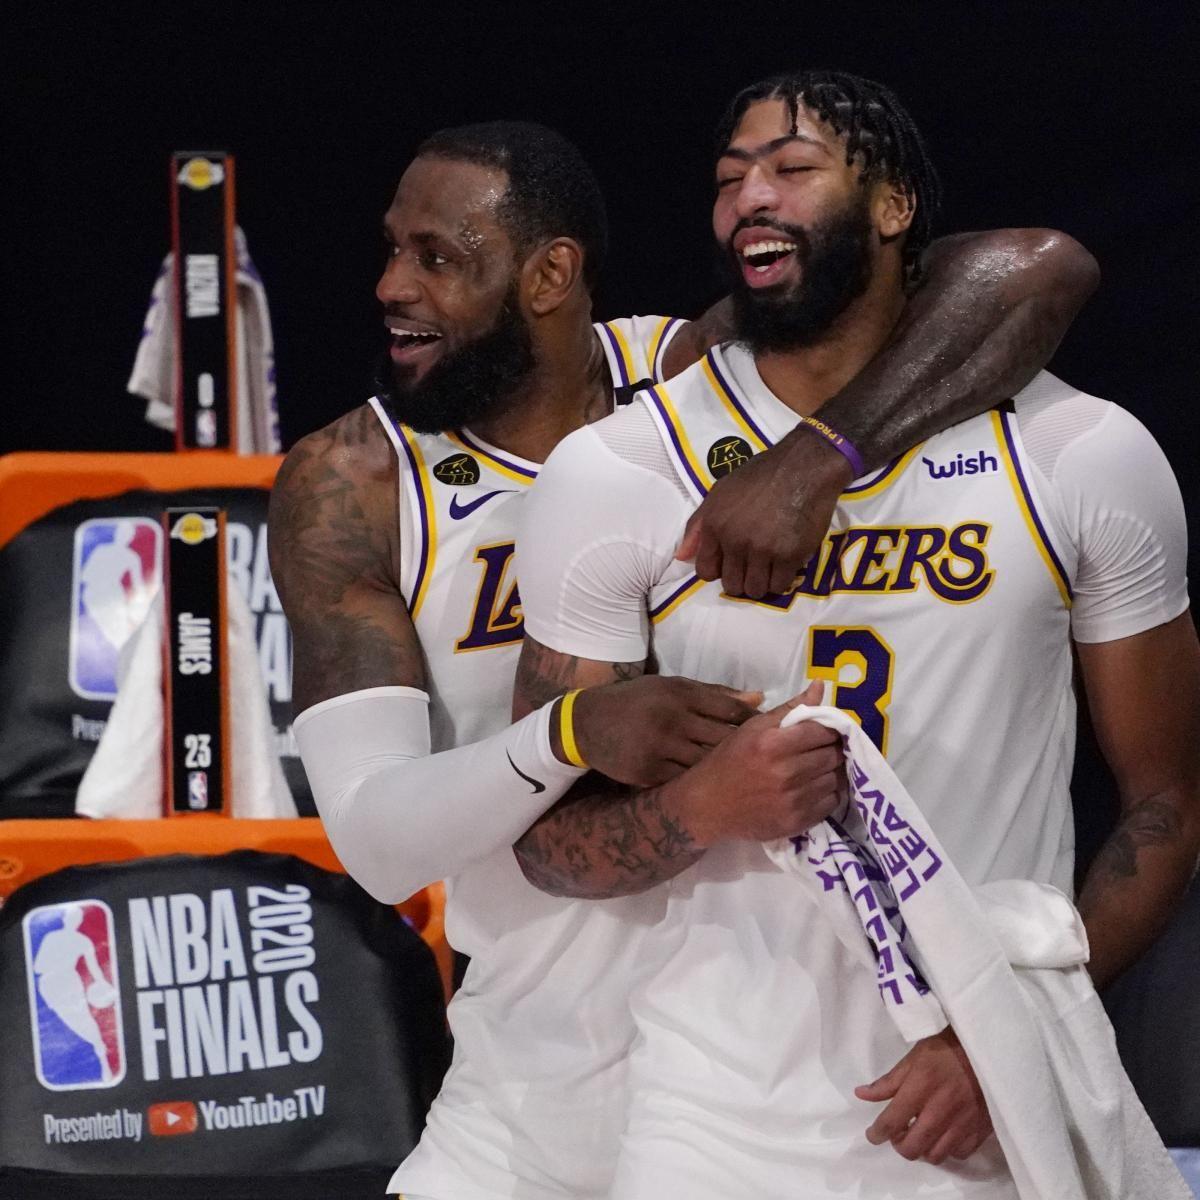 Nba Finals 2020 Lakers Vs Heat Game 6 Box Score Top Performers Reaction In 2020 Nba Finals Nba Champions Nba Funny